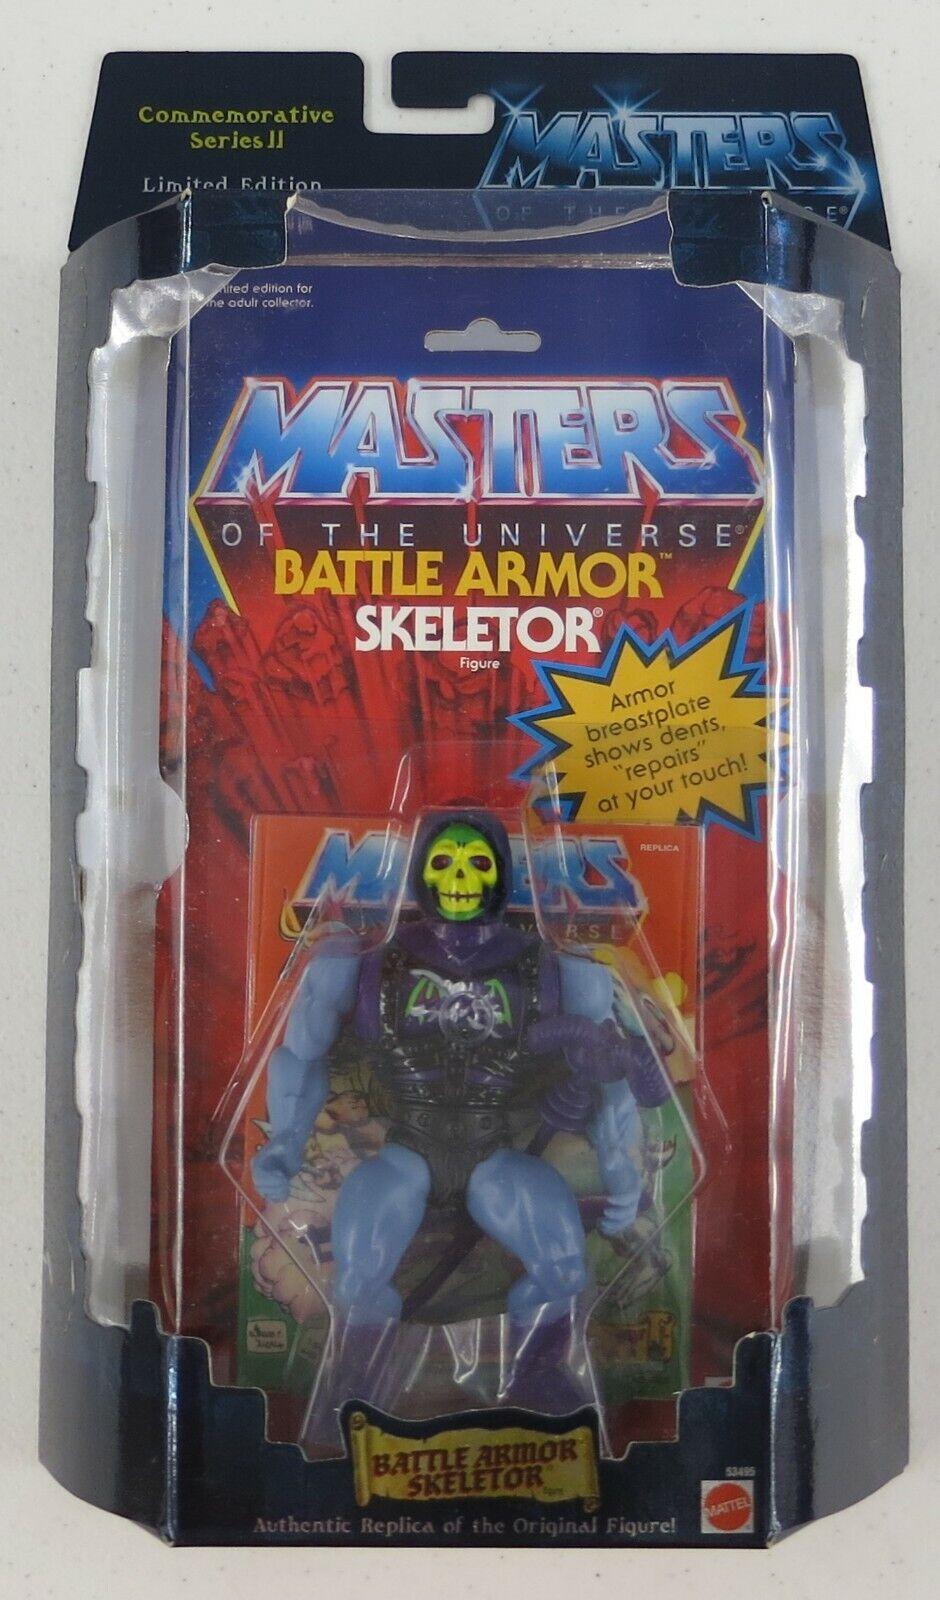 kämpfen Armor Skeletor - 2001 Masters of the Universe Commemorative serie 2